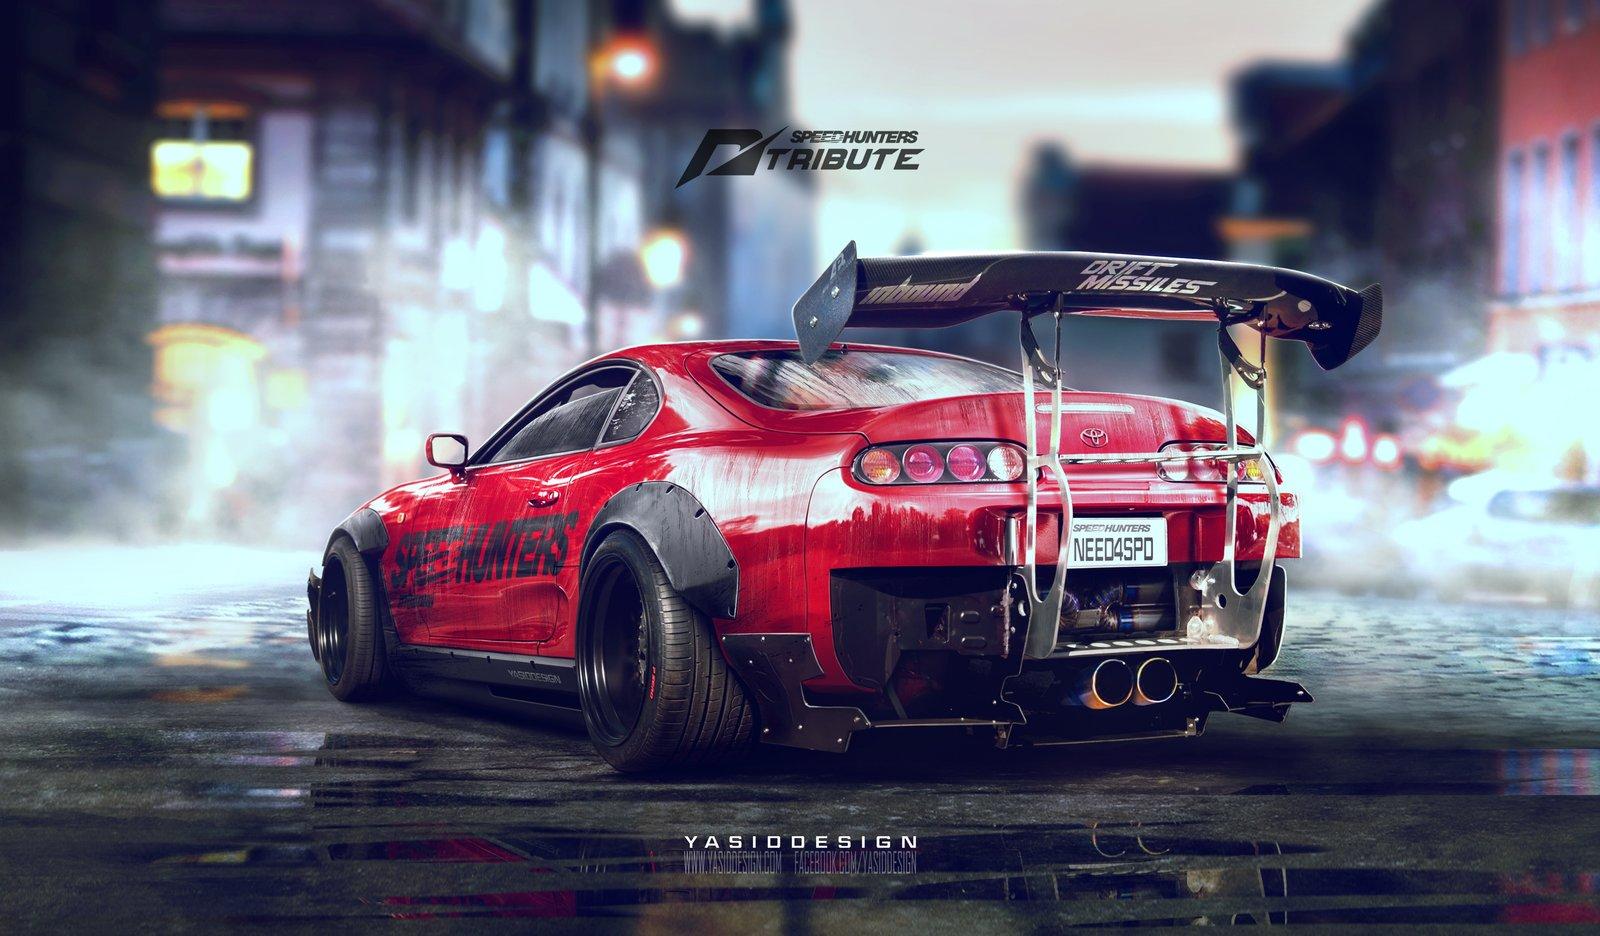 Speedhunters Toyota Supra - Need for speed tribute